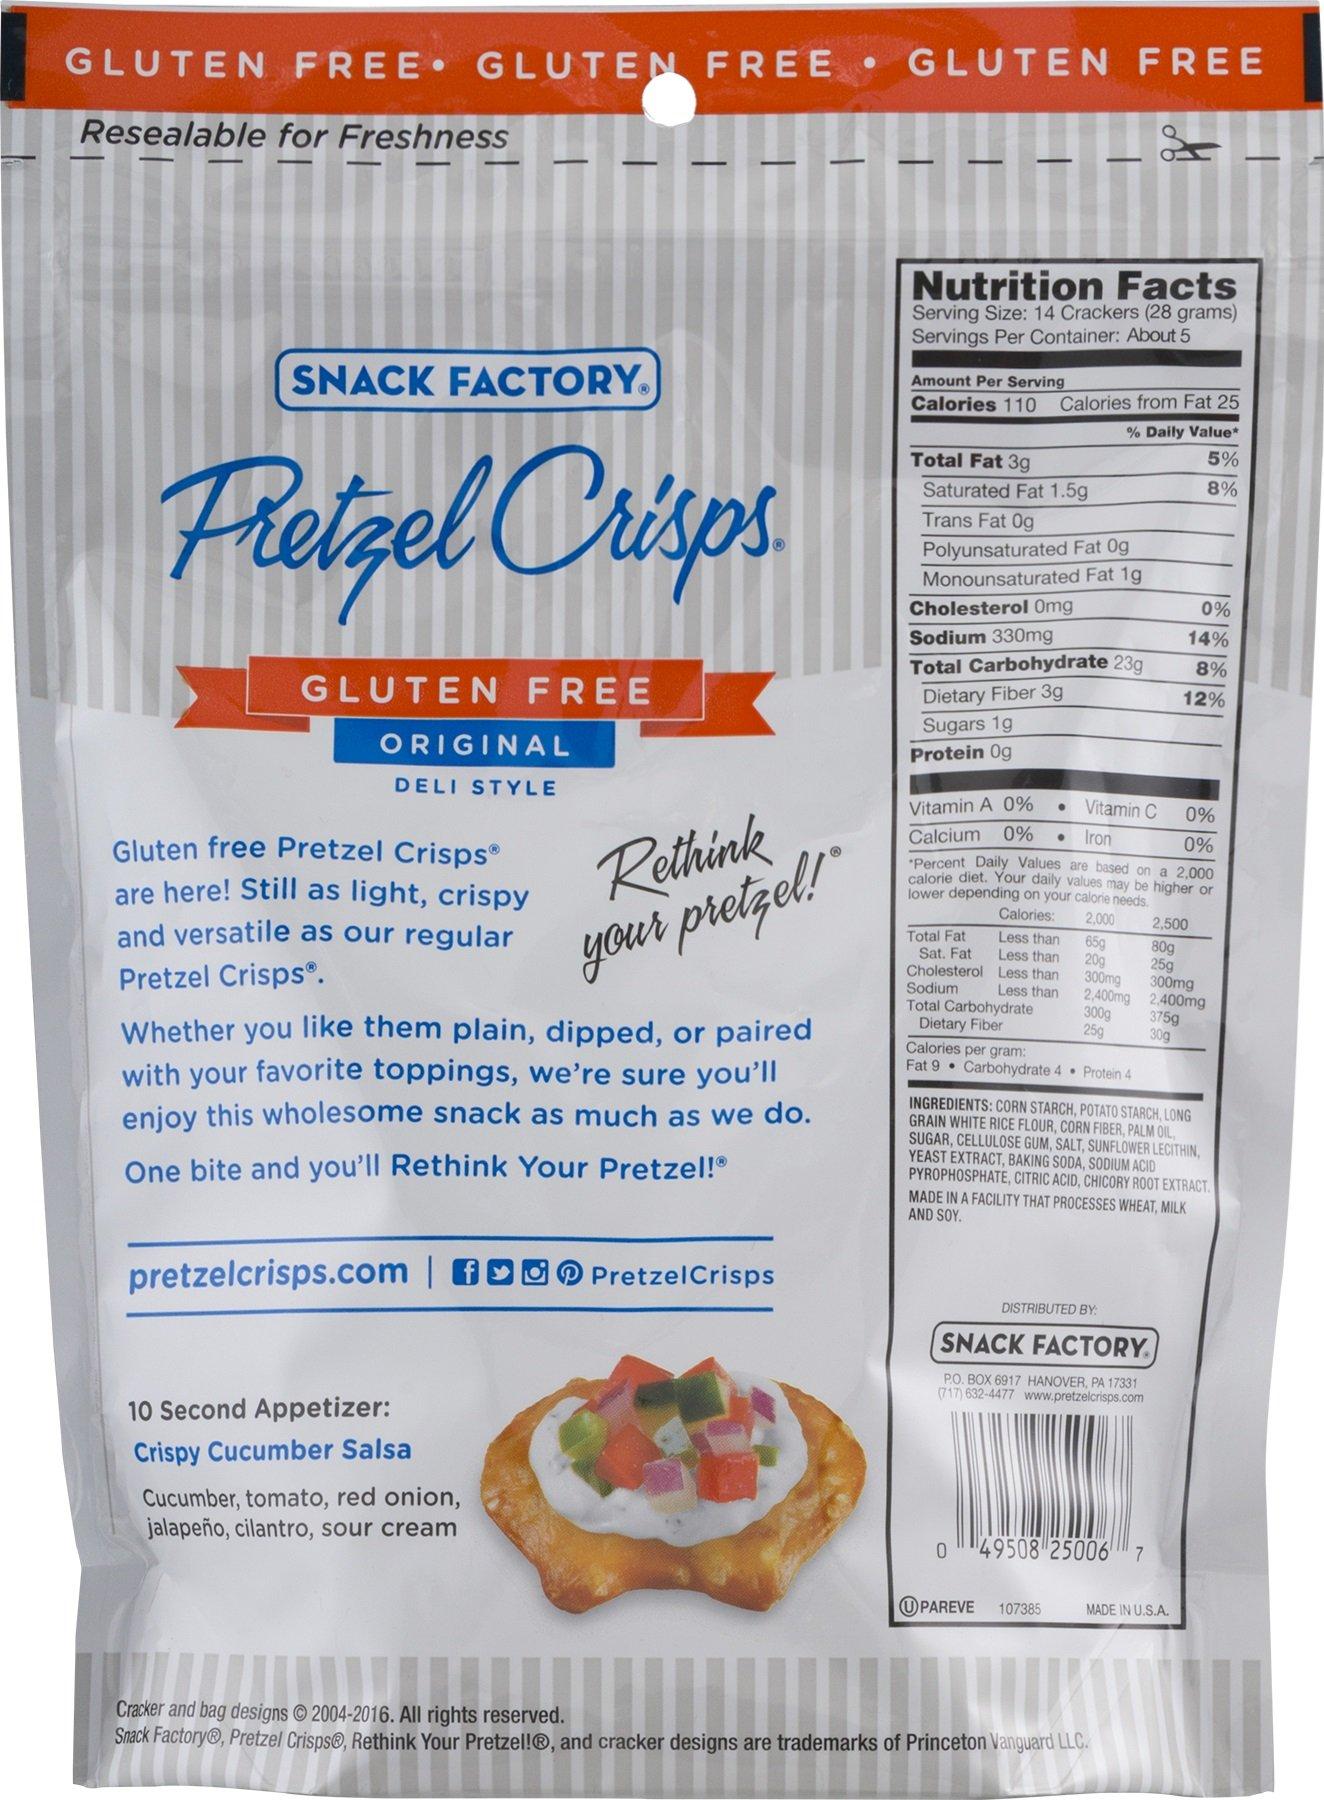 Snack Factory Gluten Free Pretzel Crisps, Original, 5 Ounce (Pack of 8)